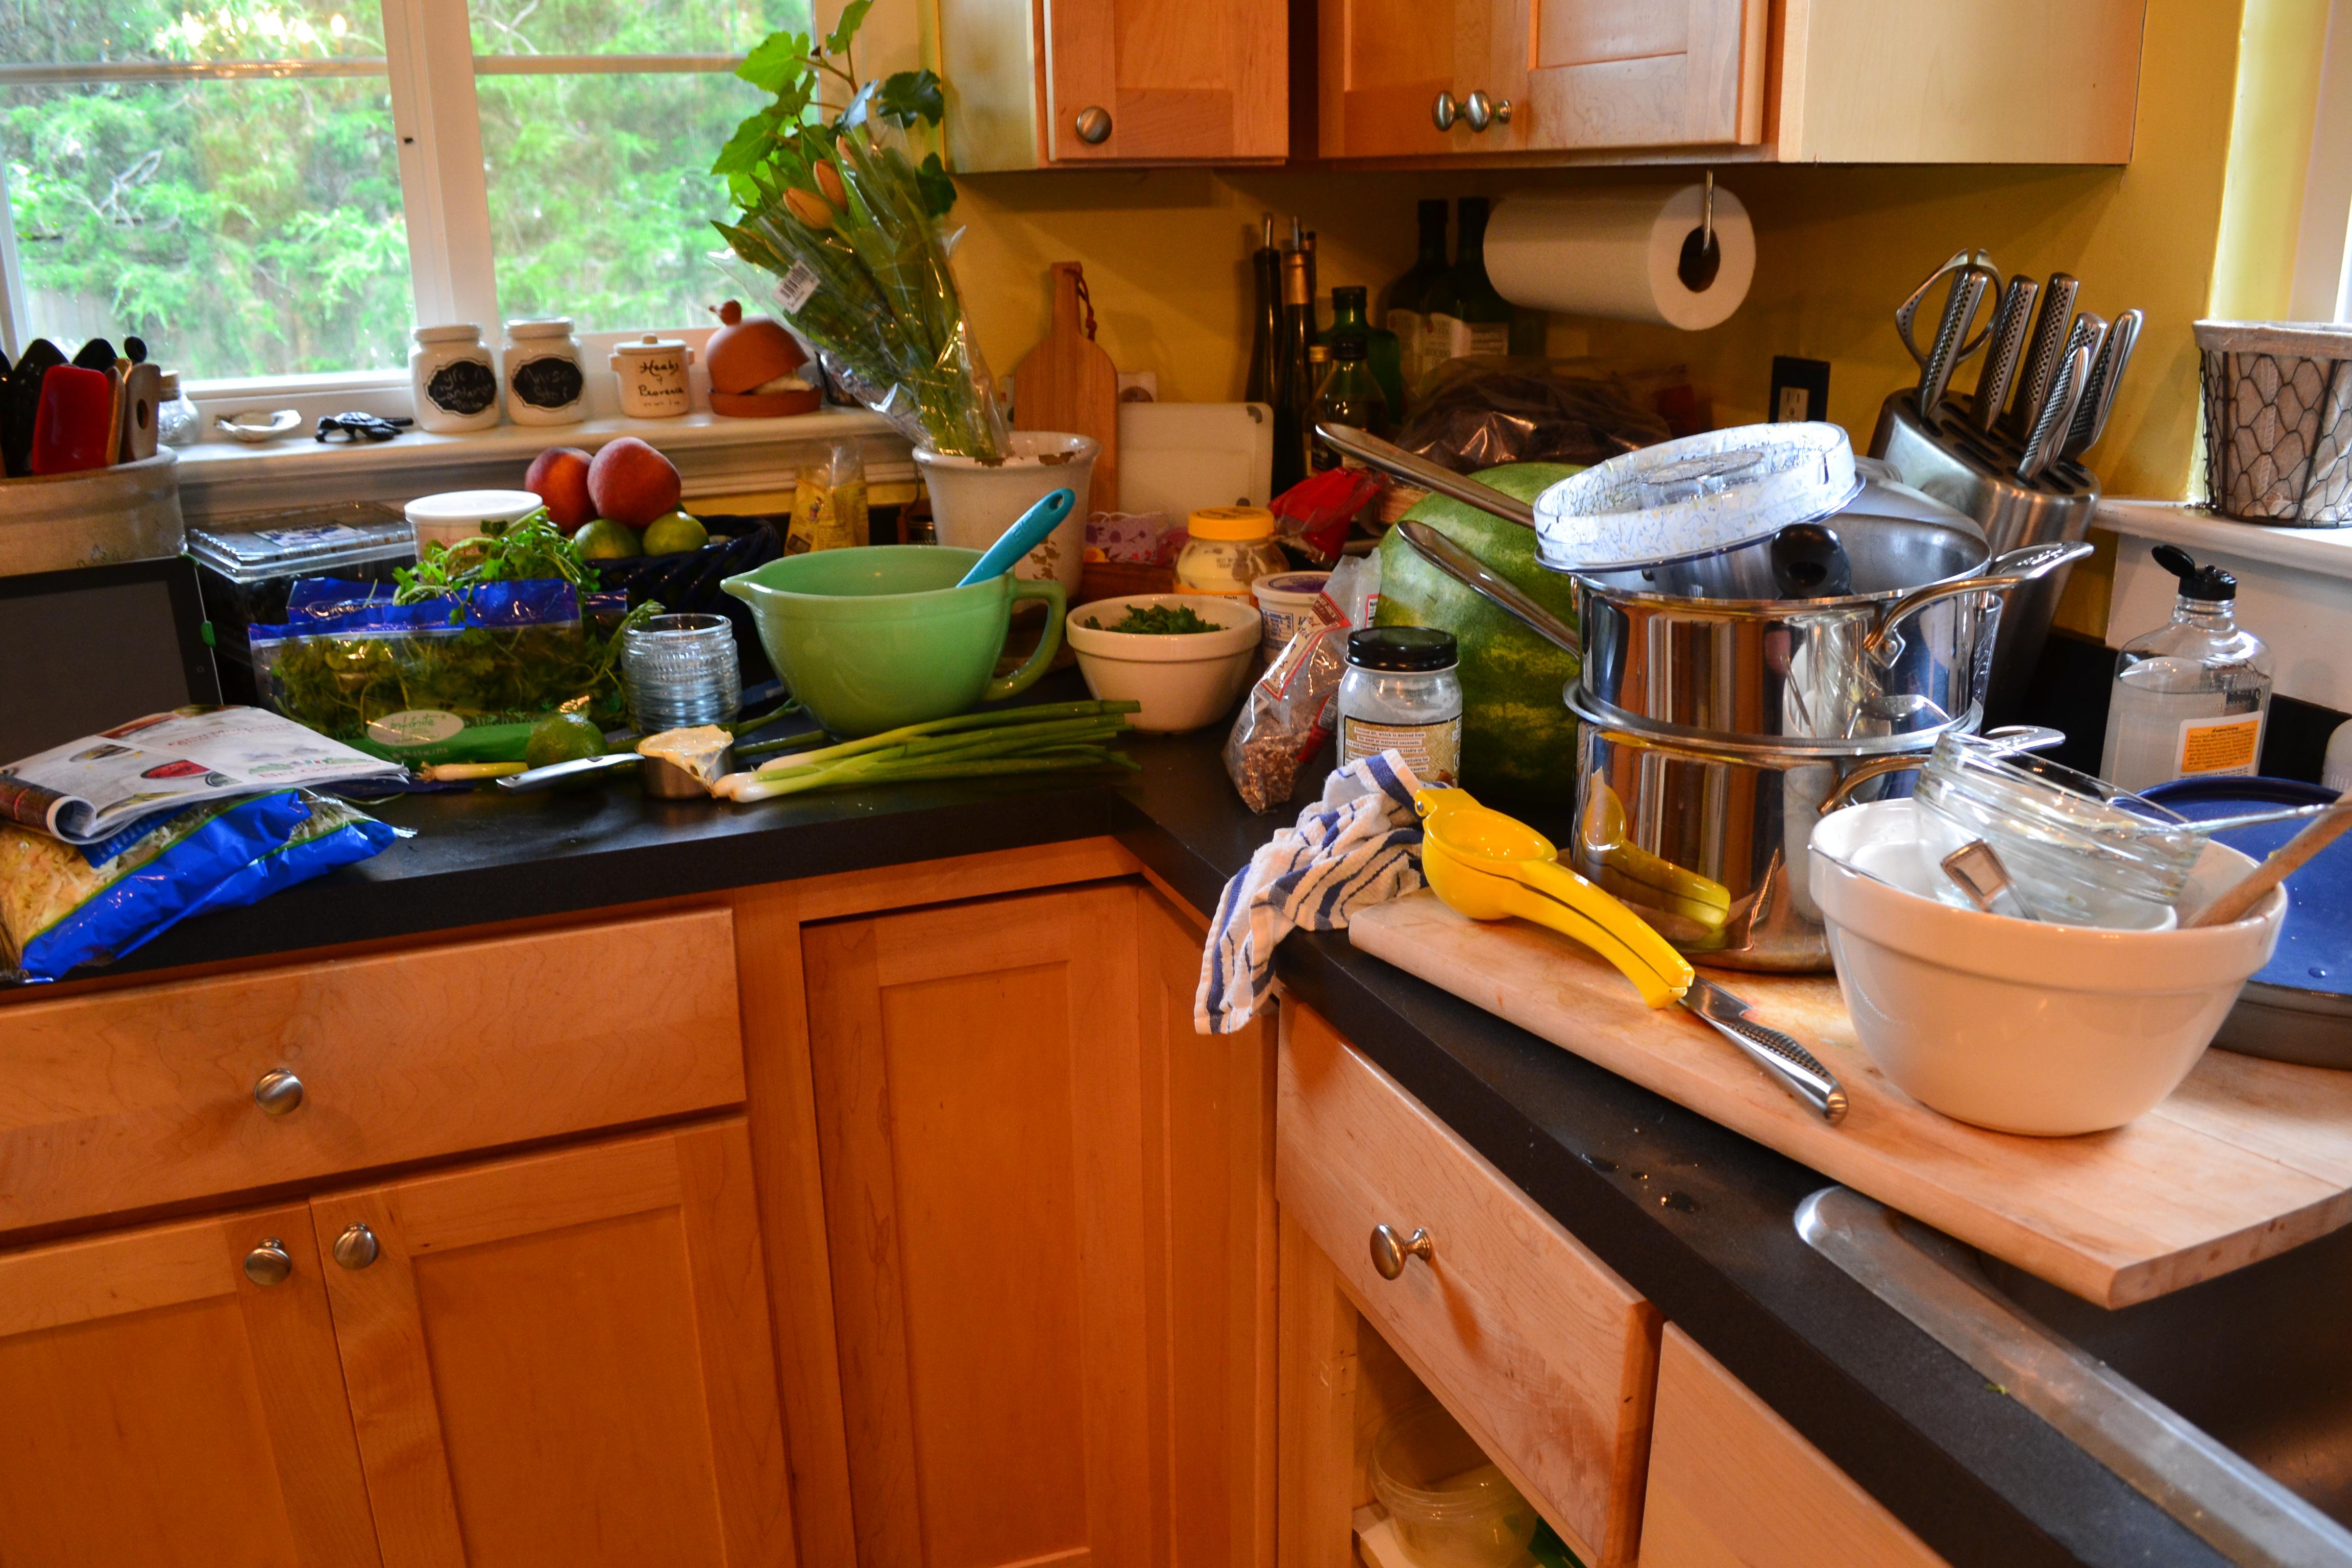 Messy Construction Kitchens : A frantic friday and fish tacos hospitality habit